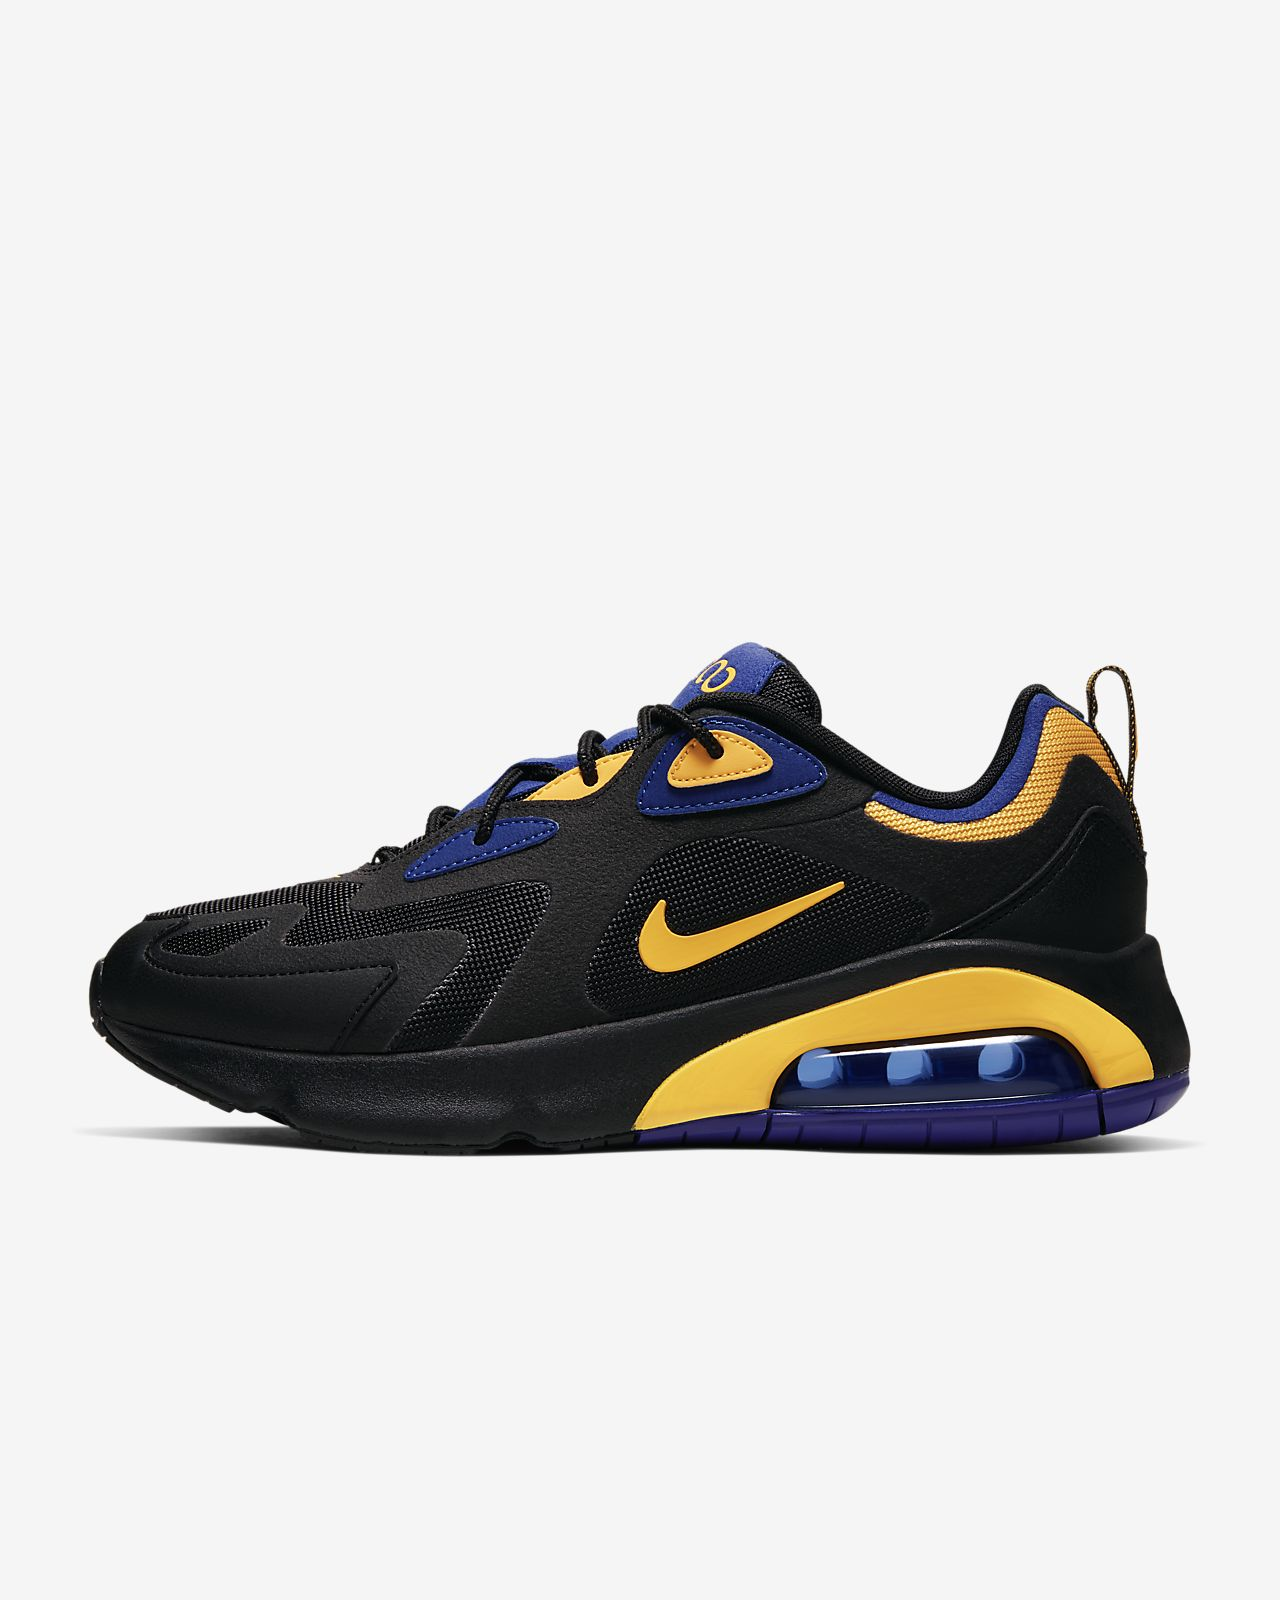 Uomo Nike Air Max 2019 scarpe nero bianco